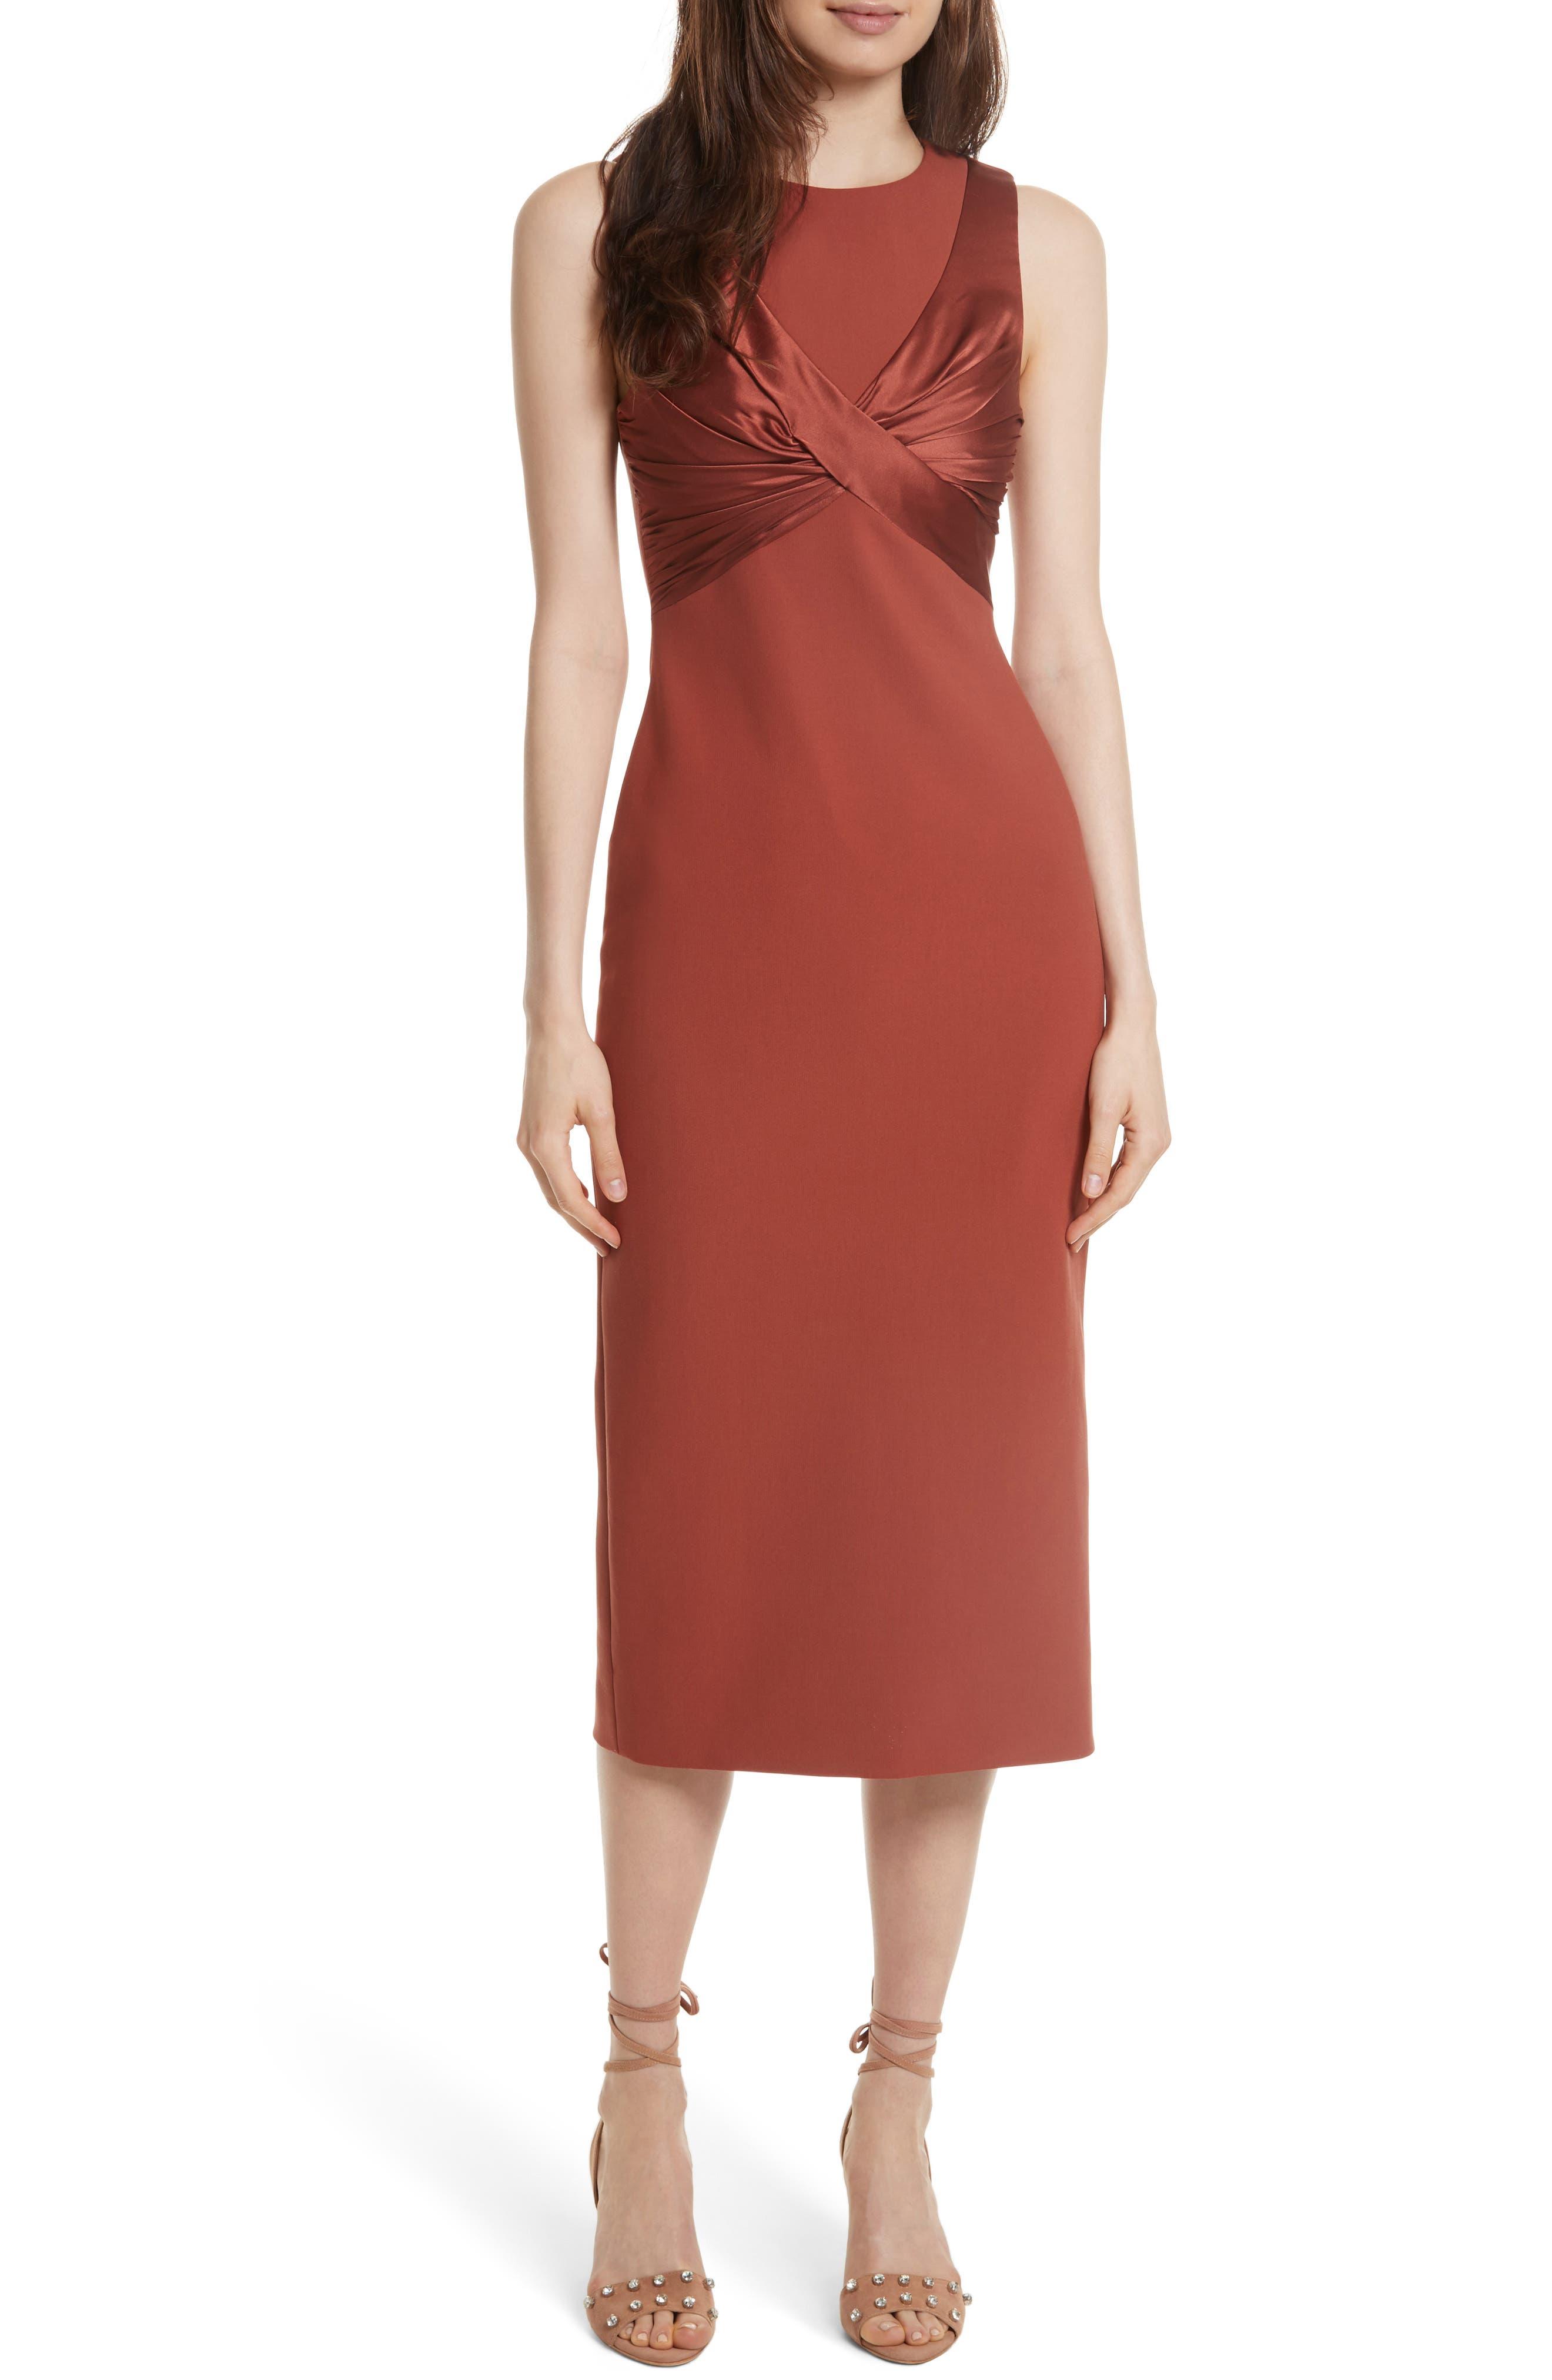 Adelise Crossover Sleeveless Sheath Dress,                             Main thumbnail 1, color,                             845